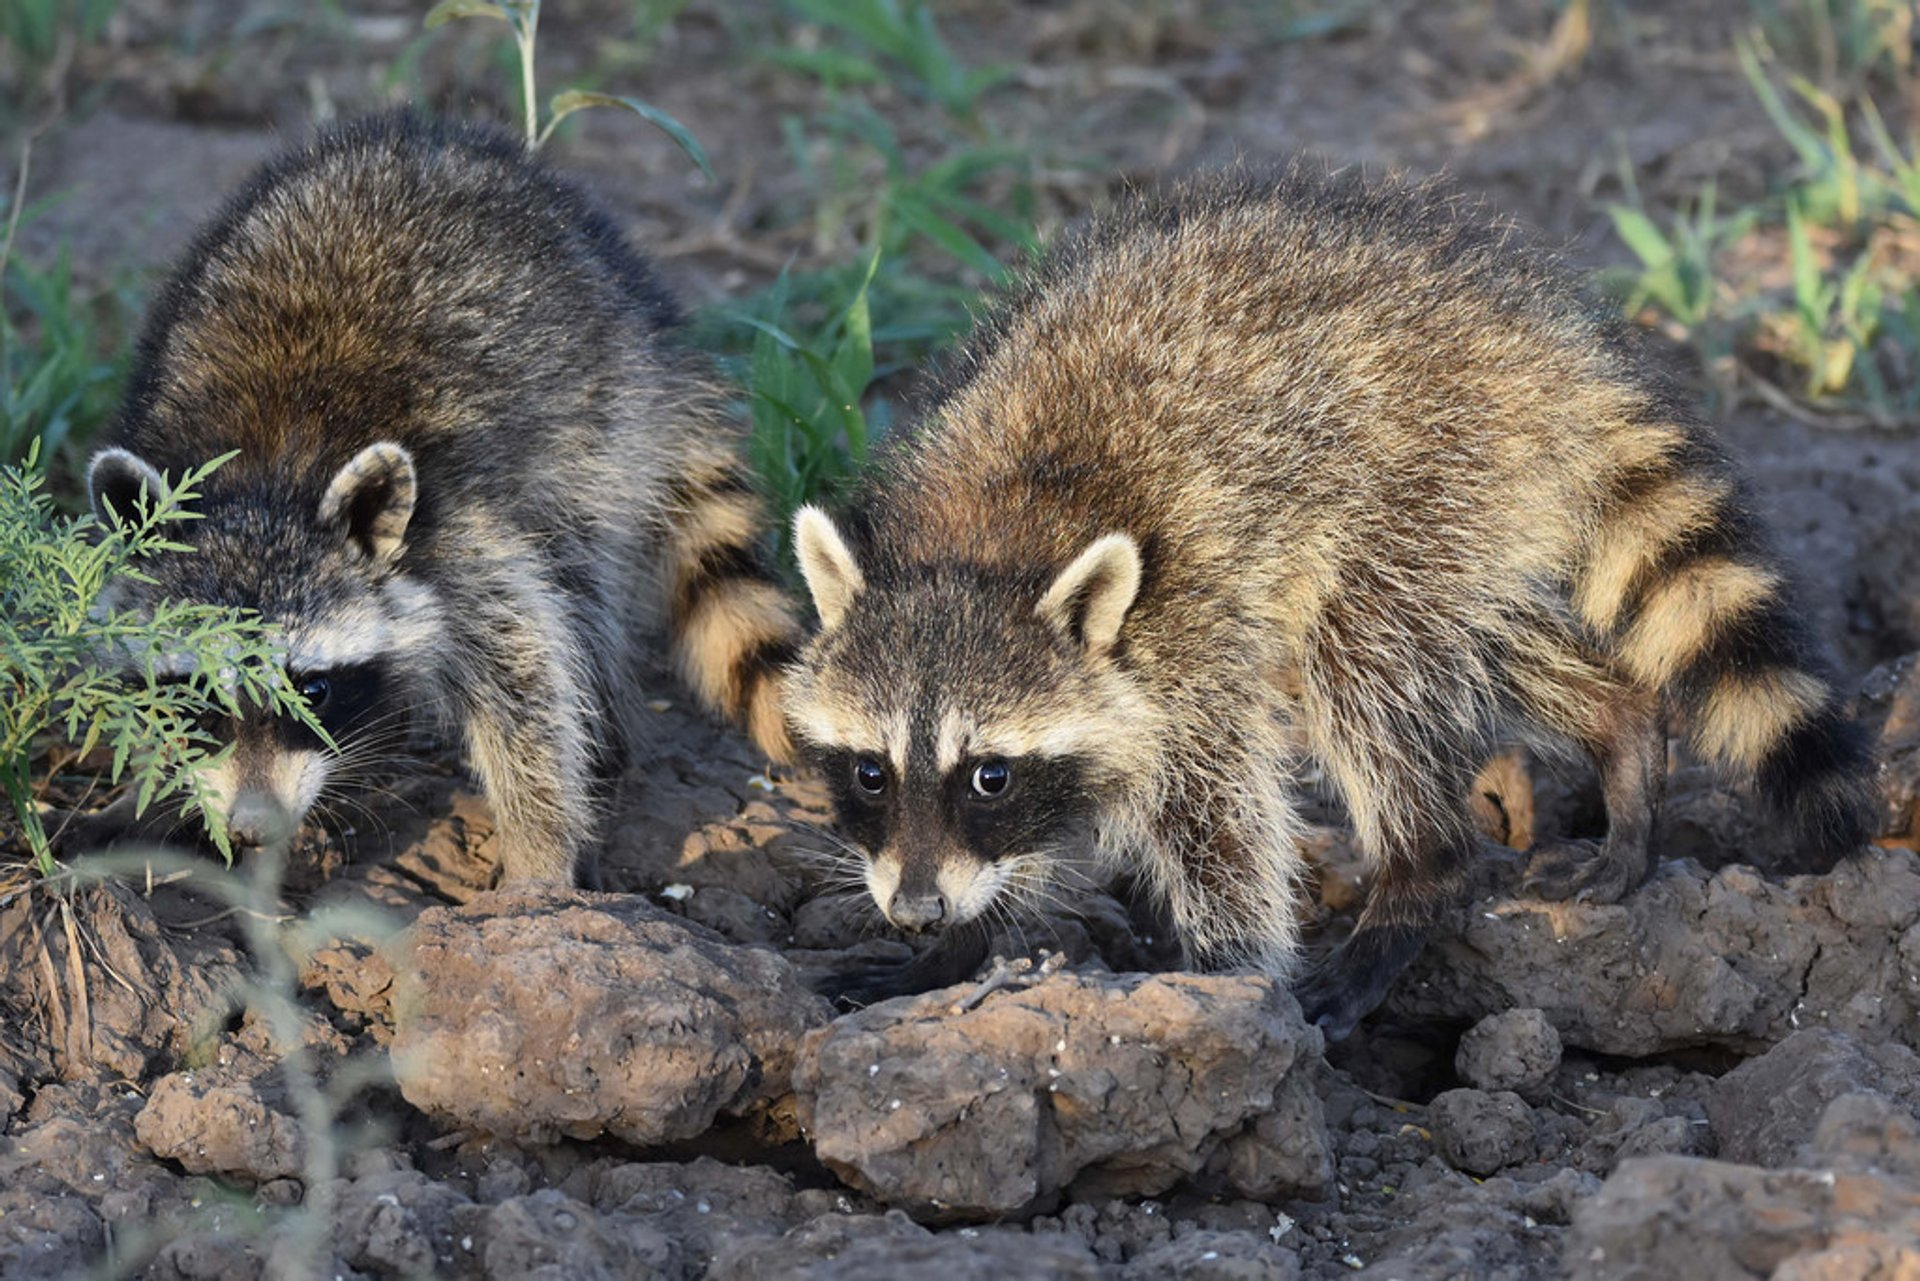 Raccoon in Texas - Best Time